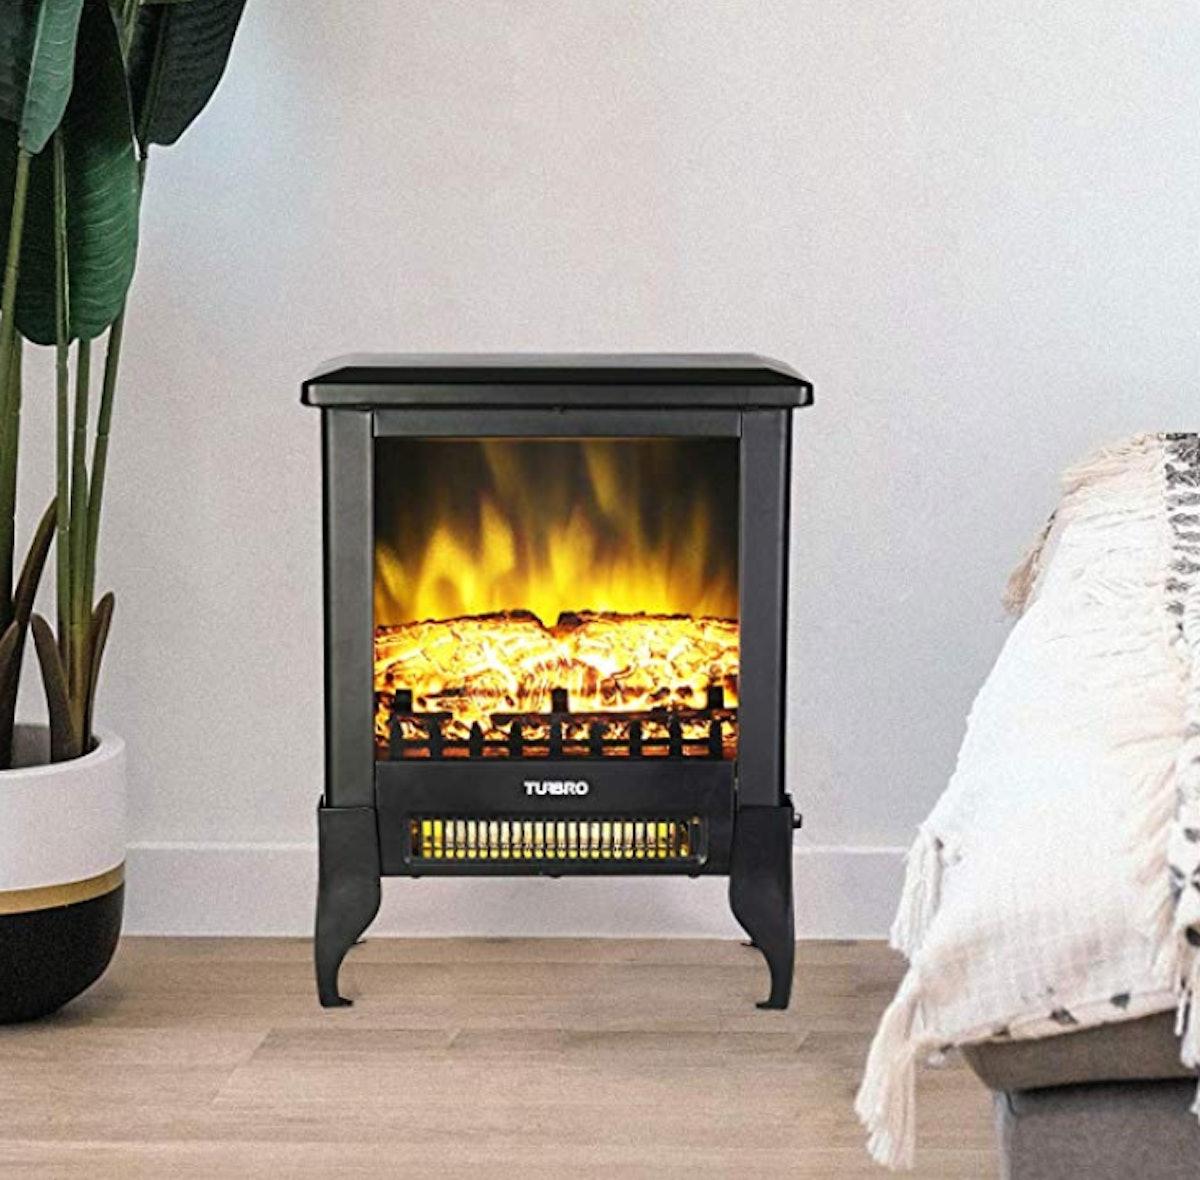 TURBRO Suburbs TS17 Compact Electric Fireplace Stove